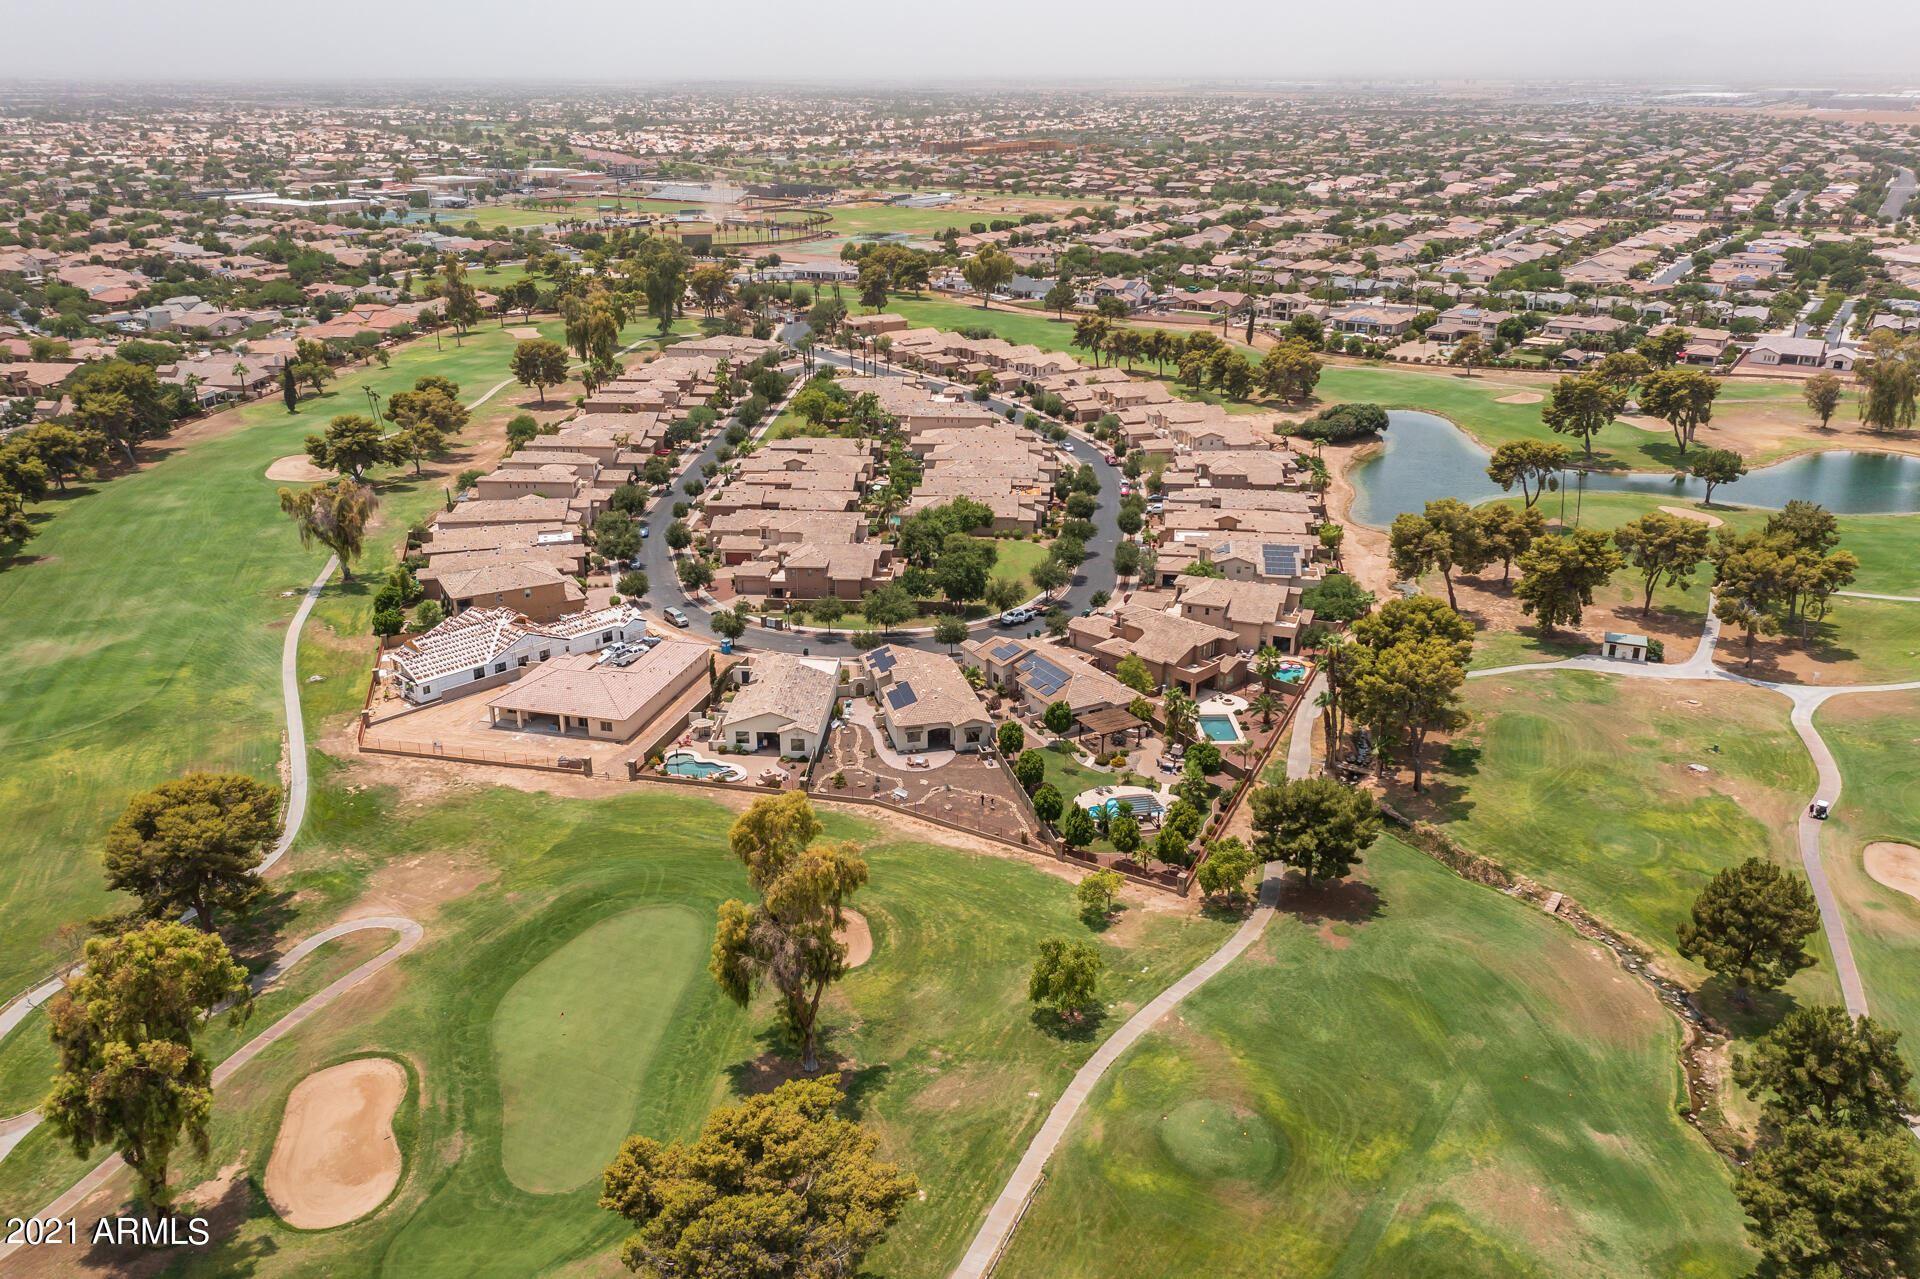 Photo of 14561 W Hidden Terrace Loop, Litchfield Park, AZ 85340 (MLS # 6266424)